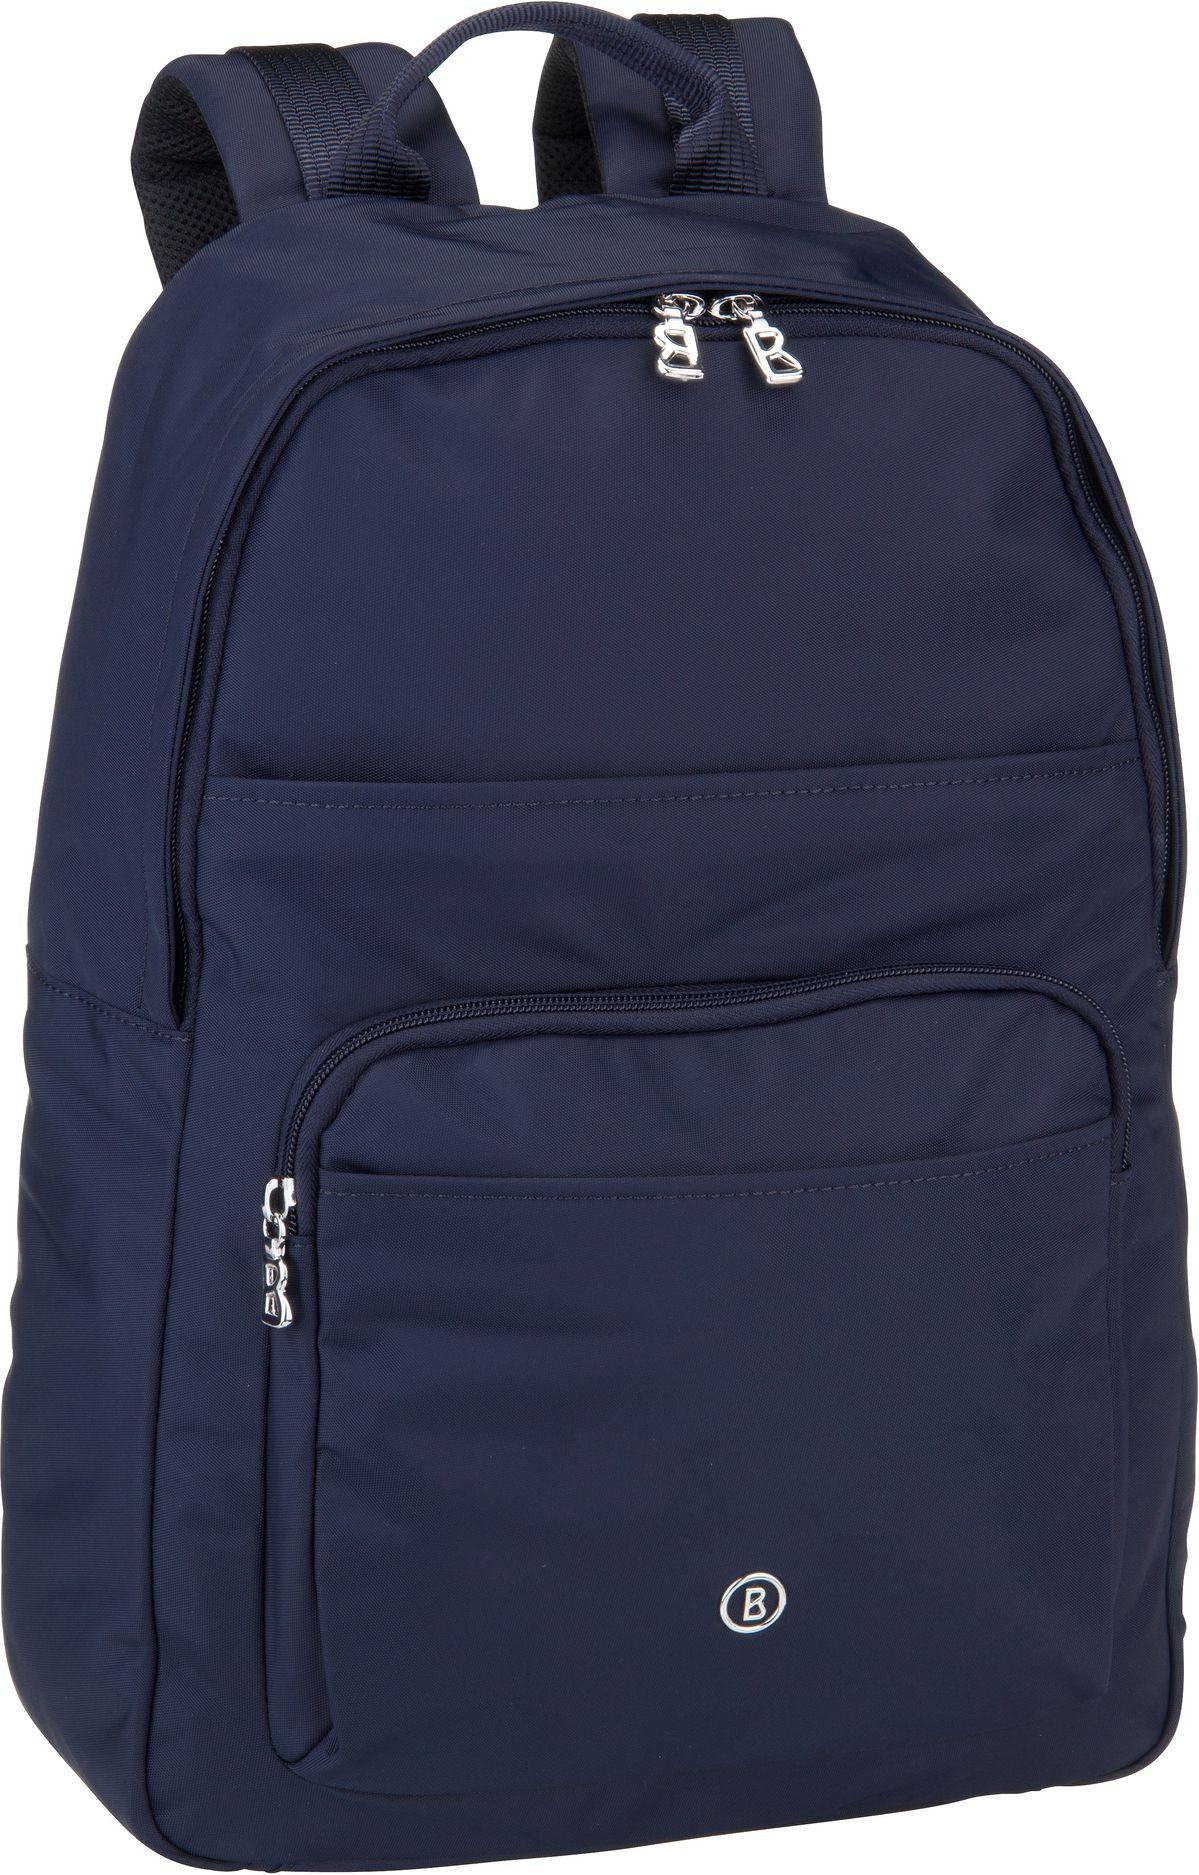 Rucksack / Daypack Verbier Henri BackPack MVZ Dark Blue